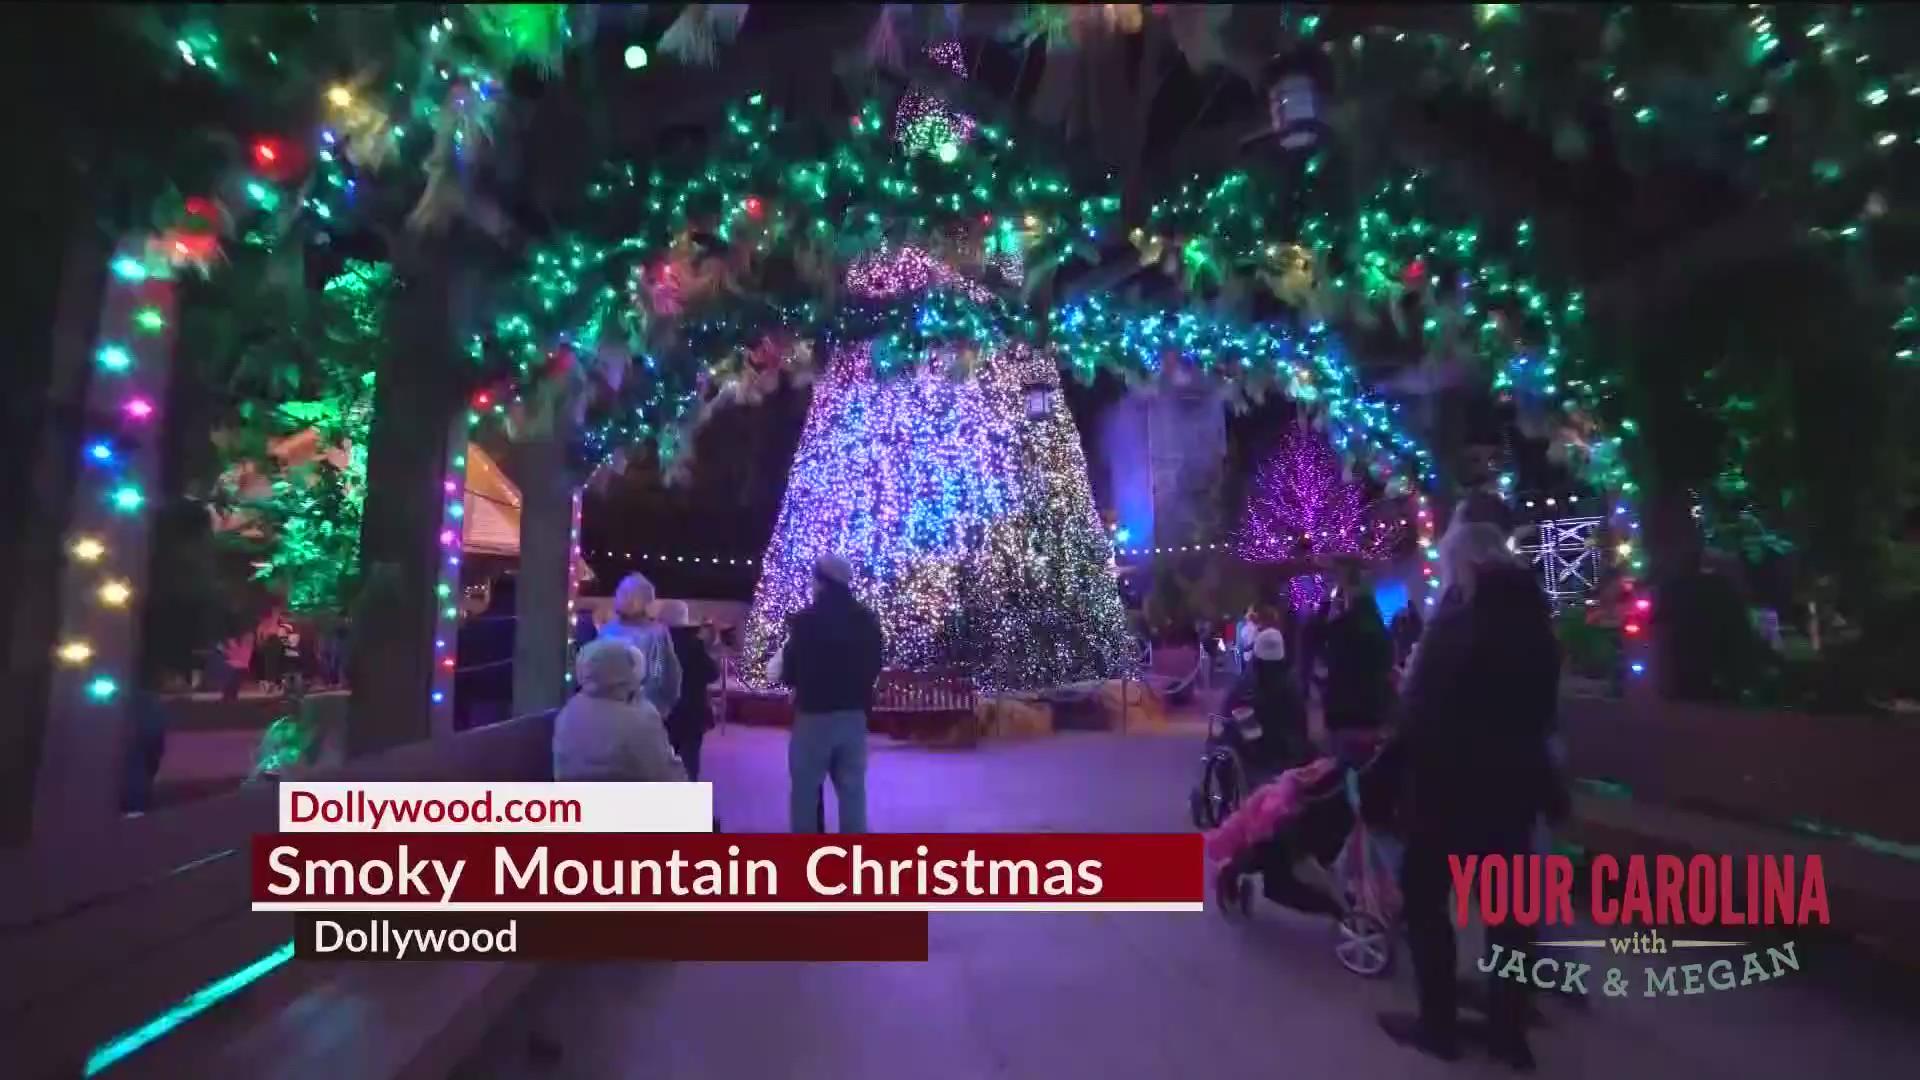 Smoky Mountain Christmas at Dollywood